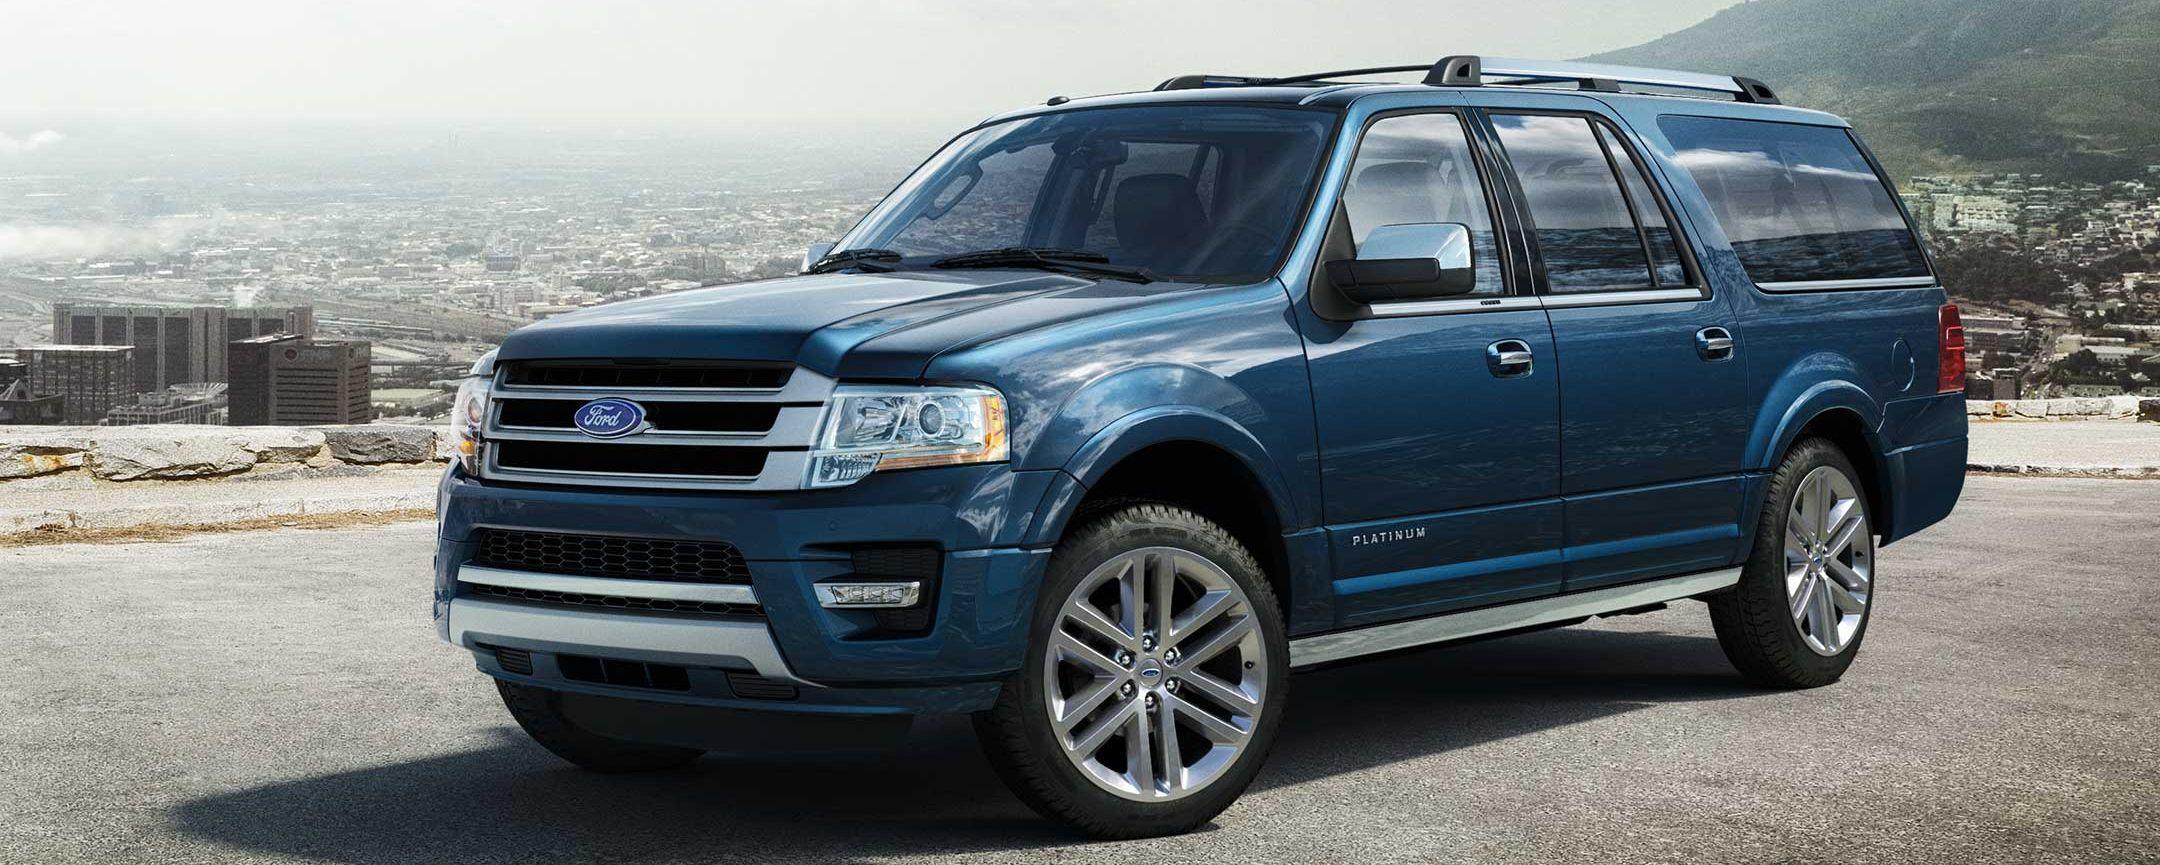 Ford Expedition El For Sale Near Oklahoma City Ok